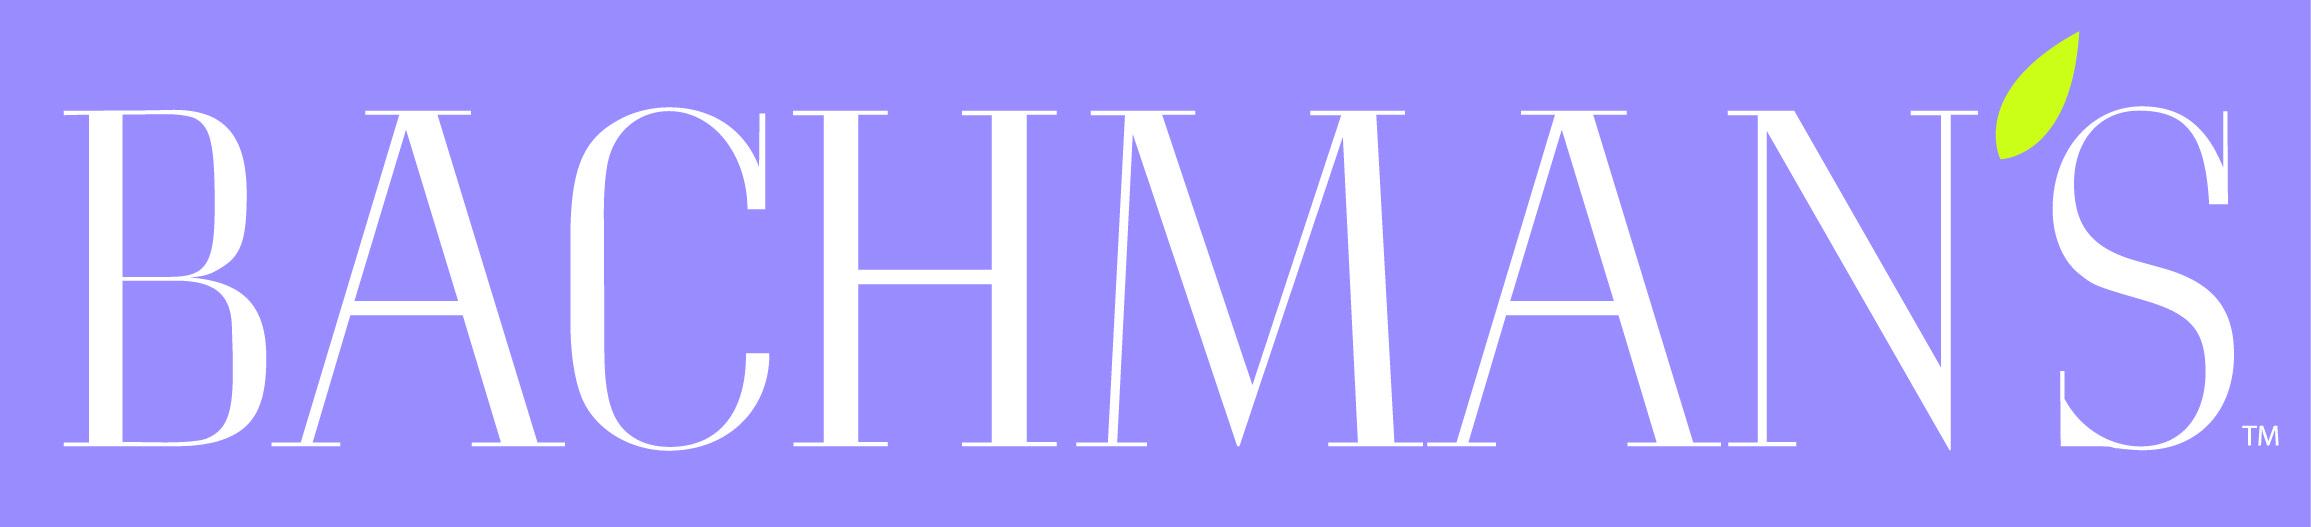 Bachman's Logo